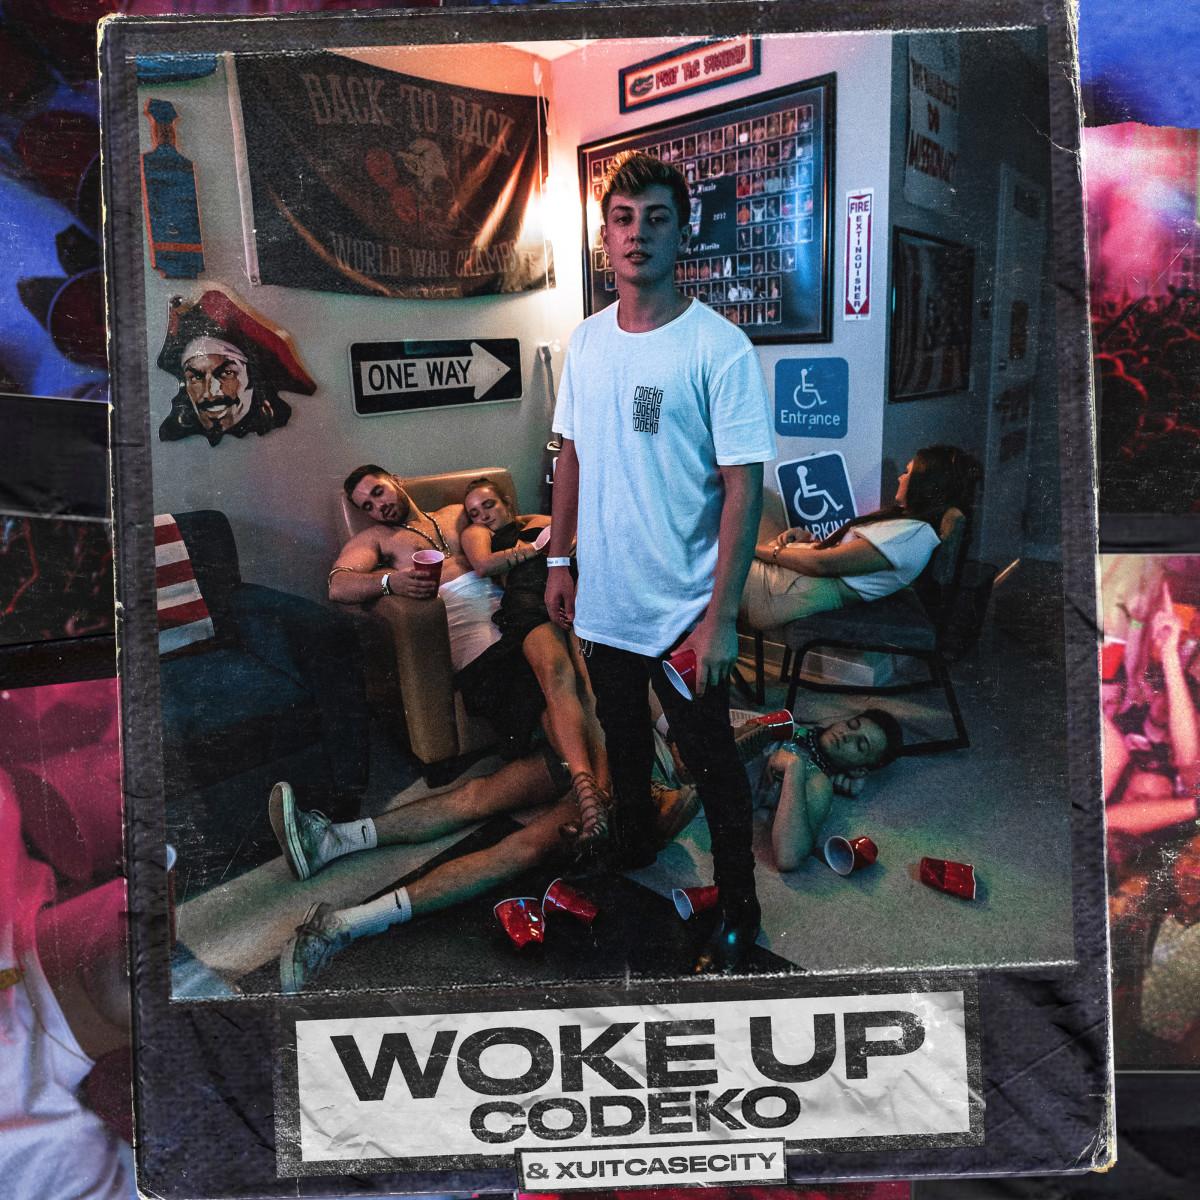 Woke Up Album Art